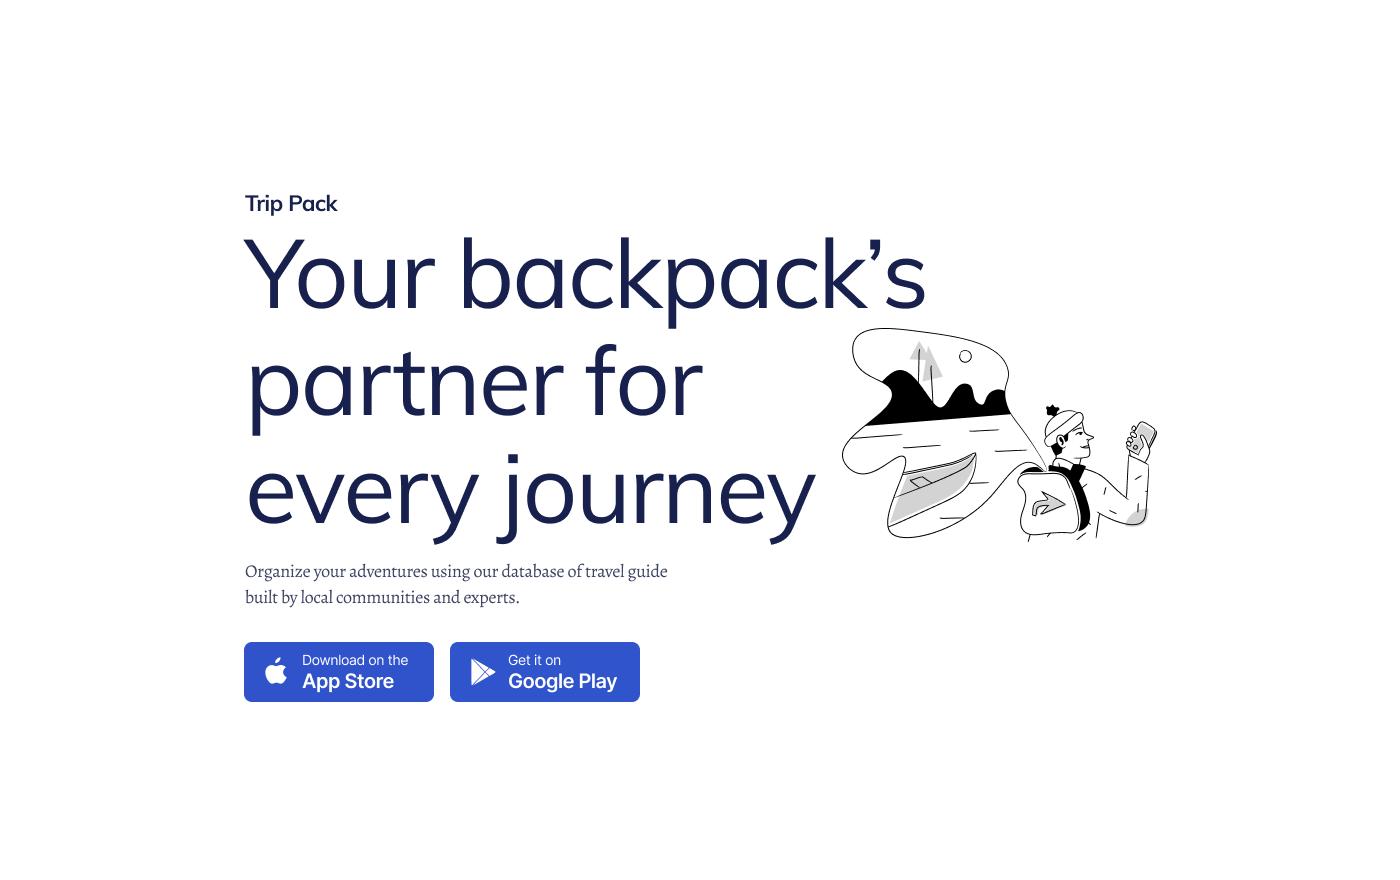 Trip pack website landing page